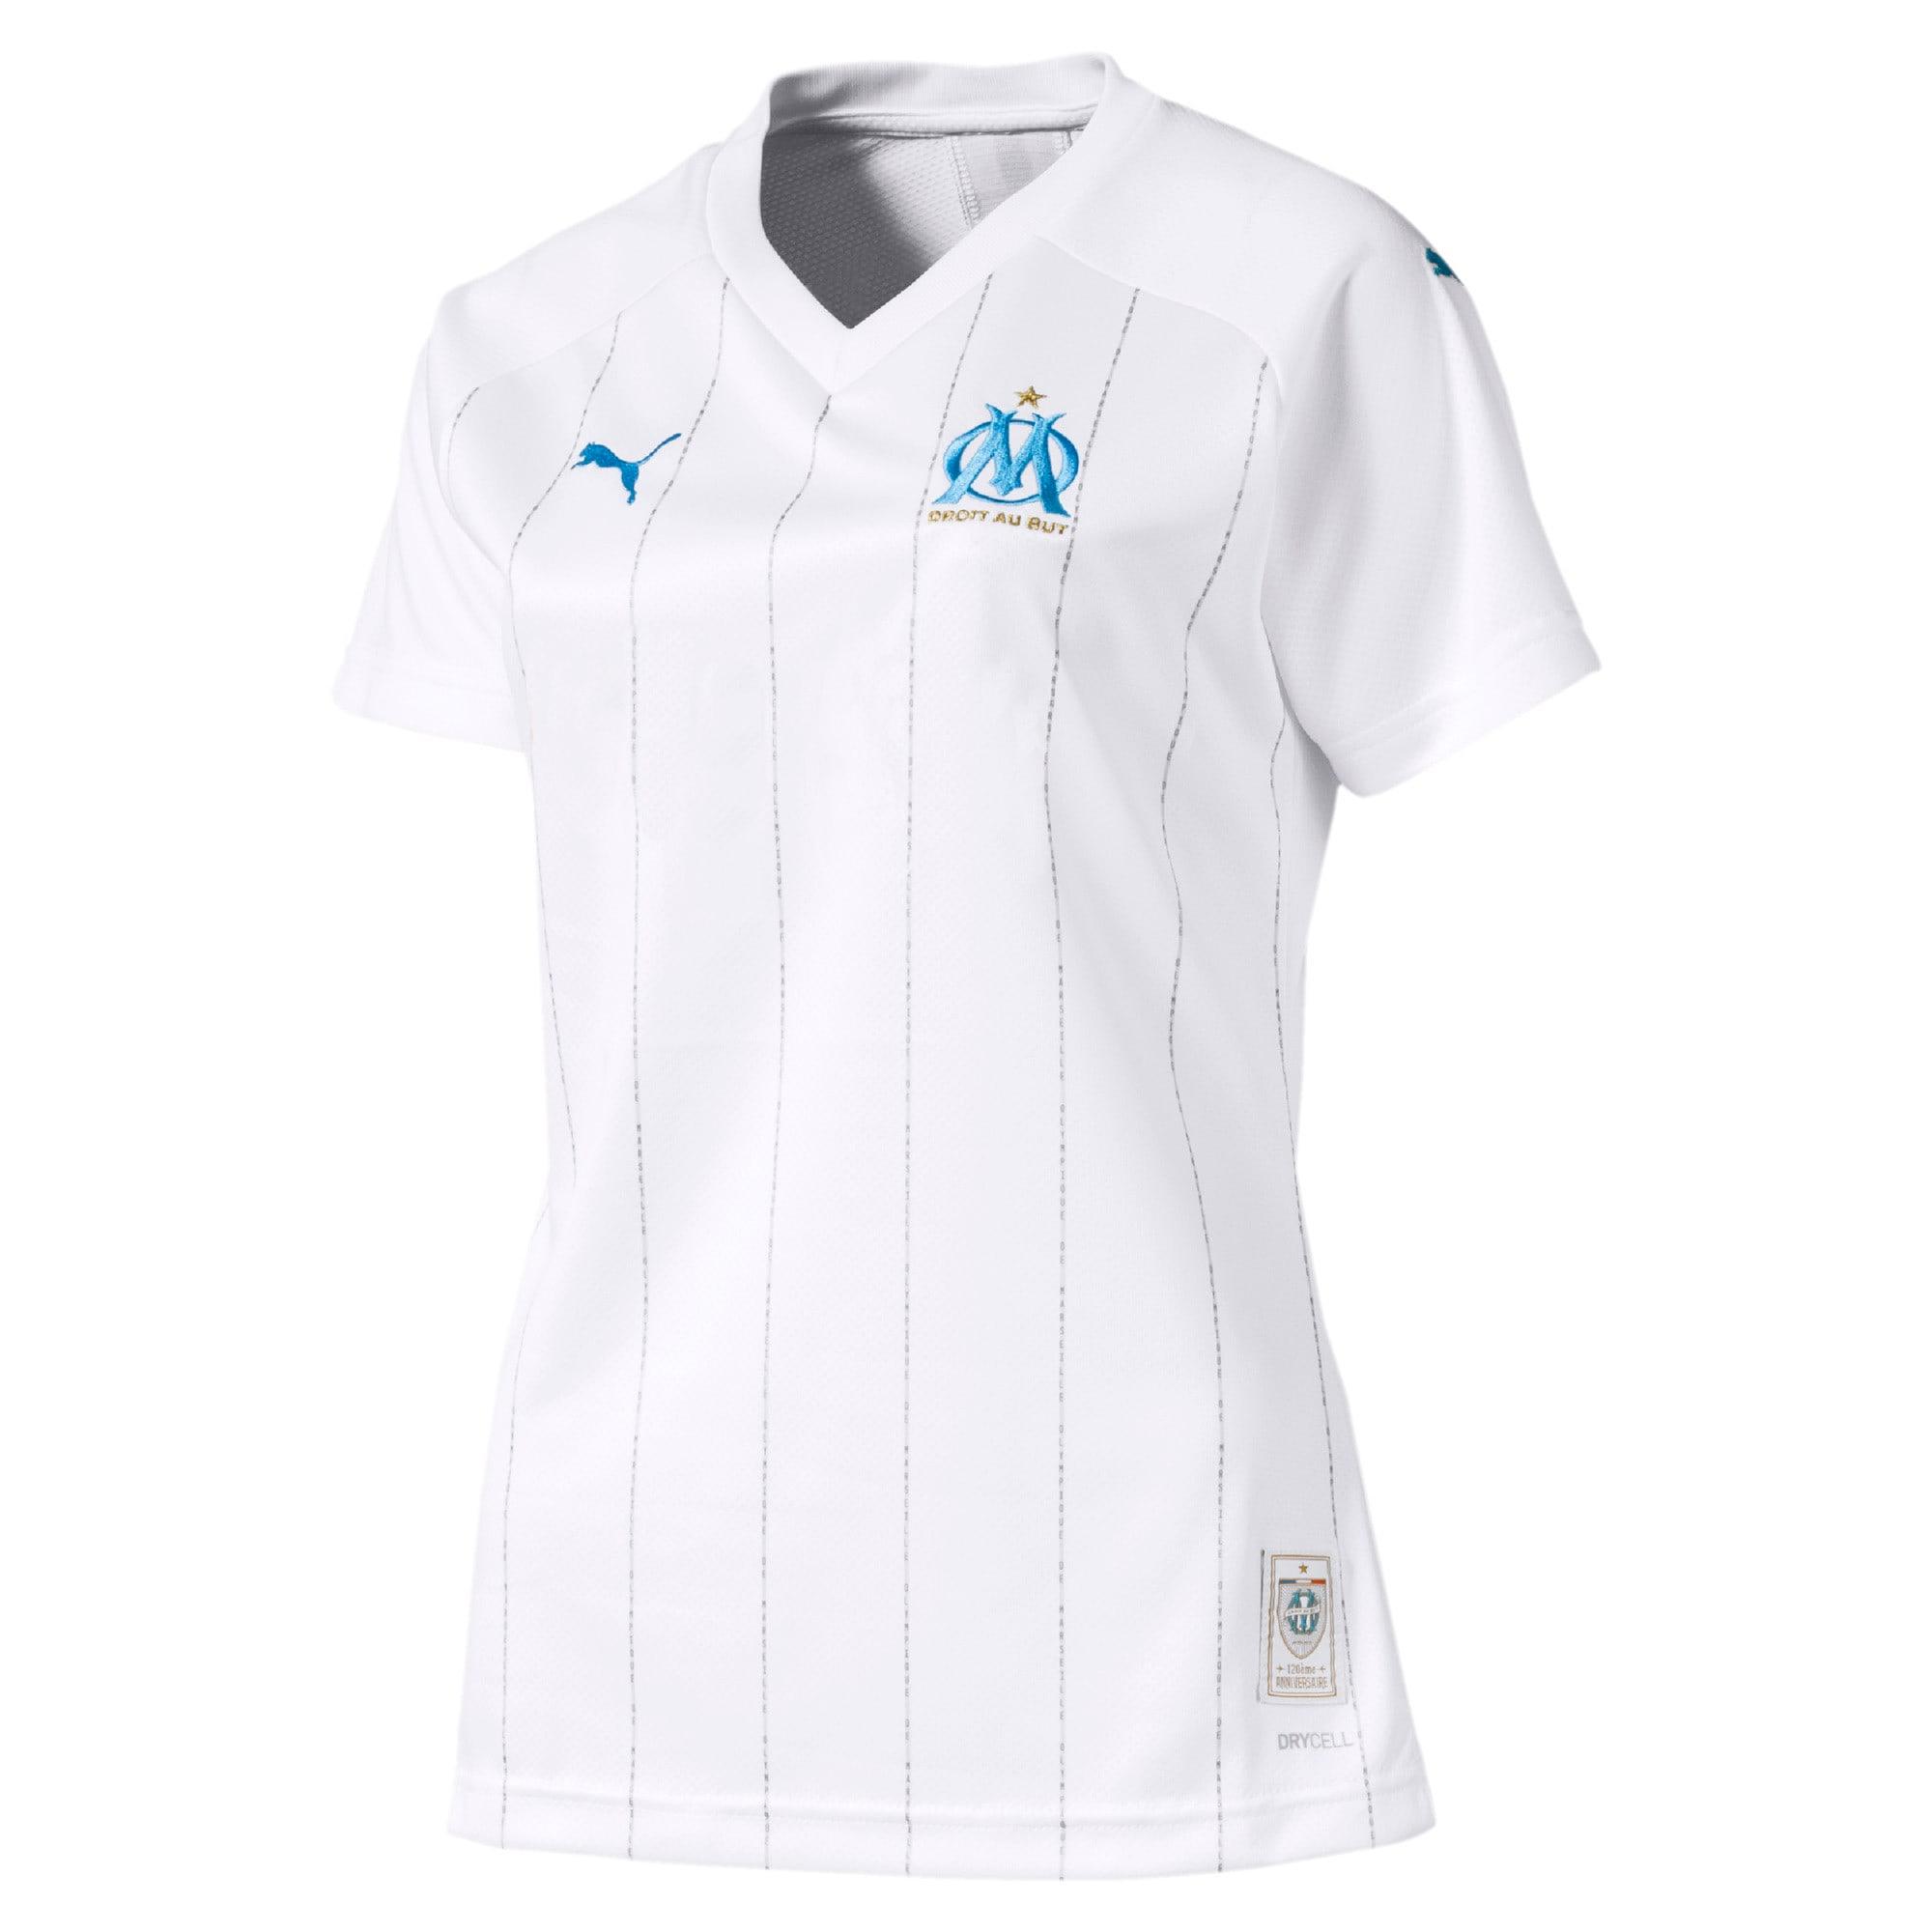 Thumbnail 1 of Olympique de Marseille Women's Home Replica Jersey, Puma White-Bleu Azur, medium